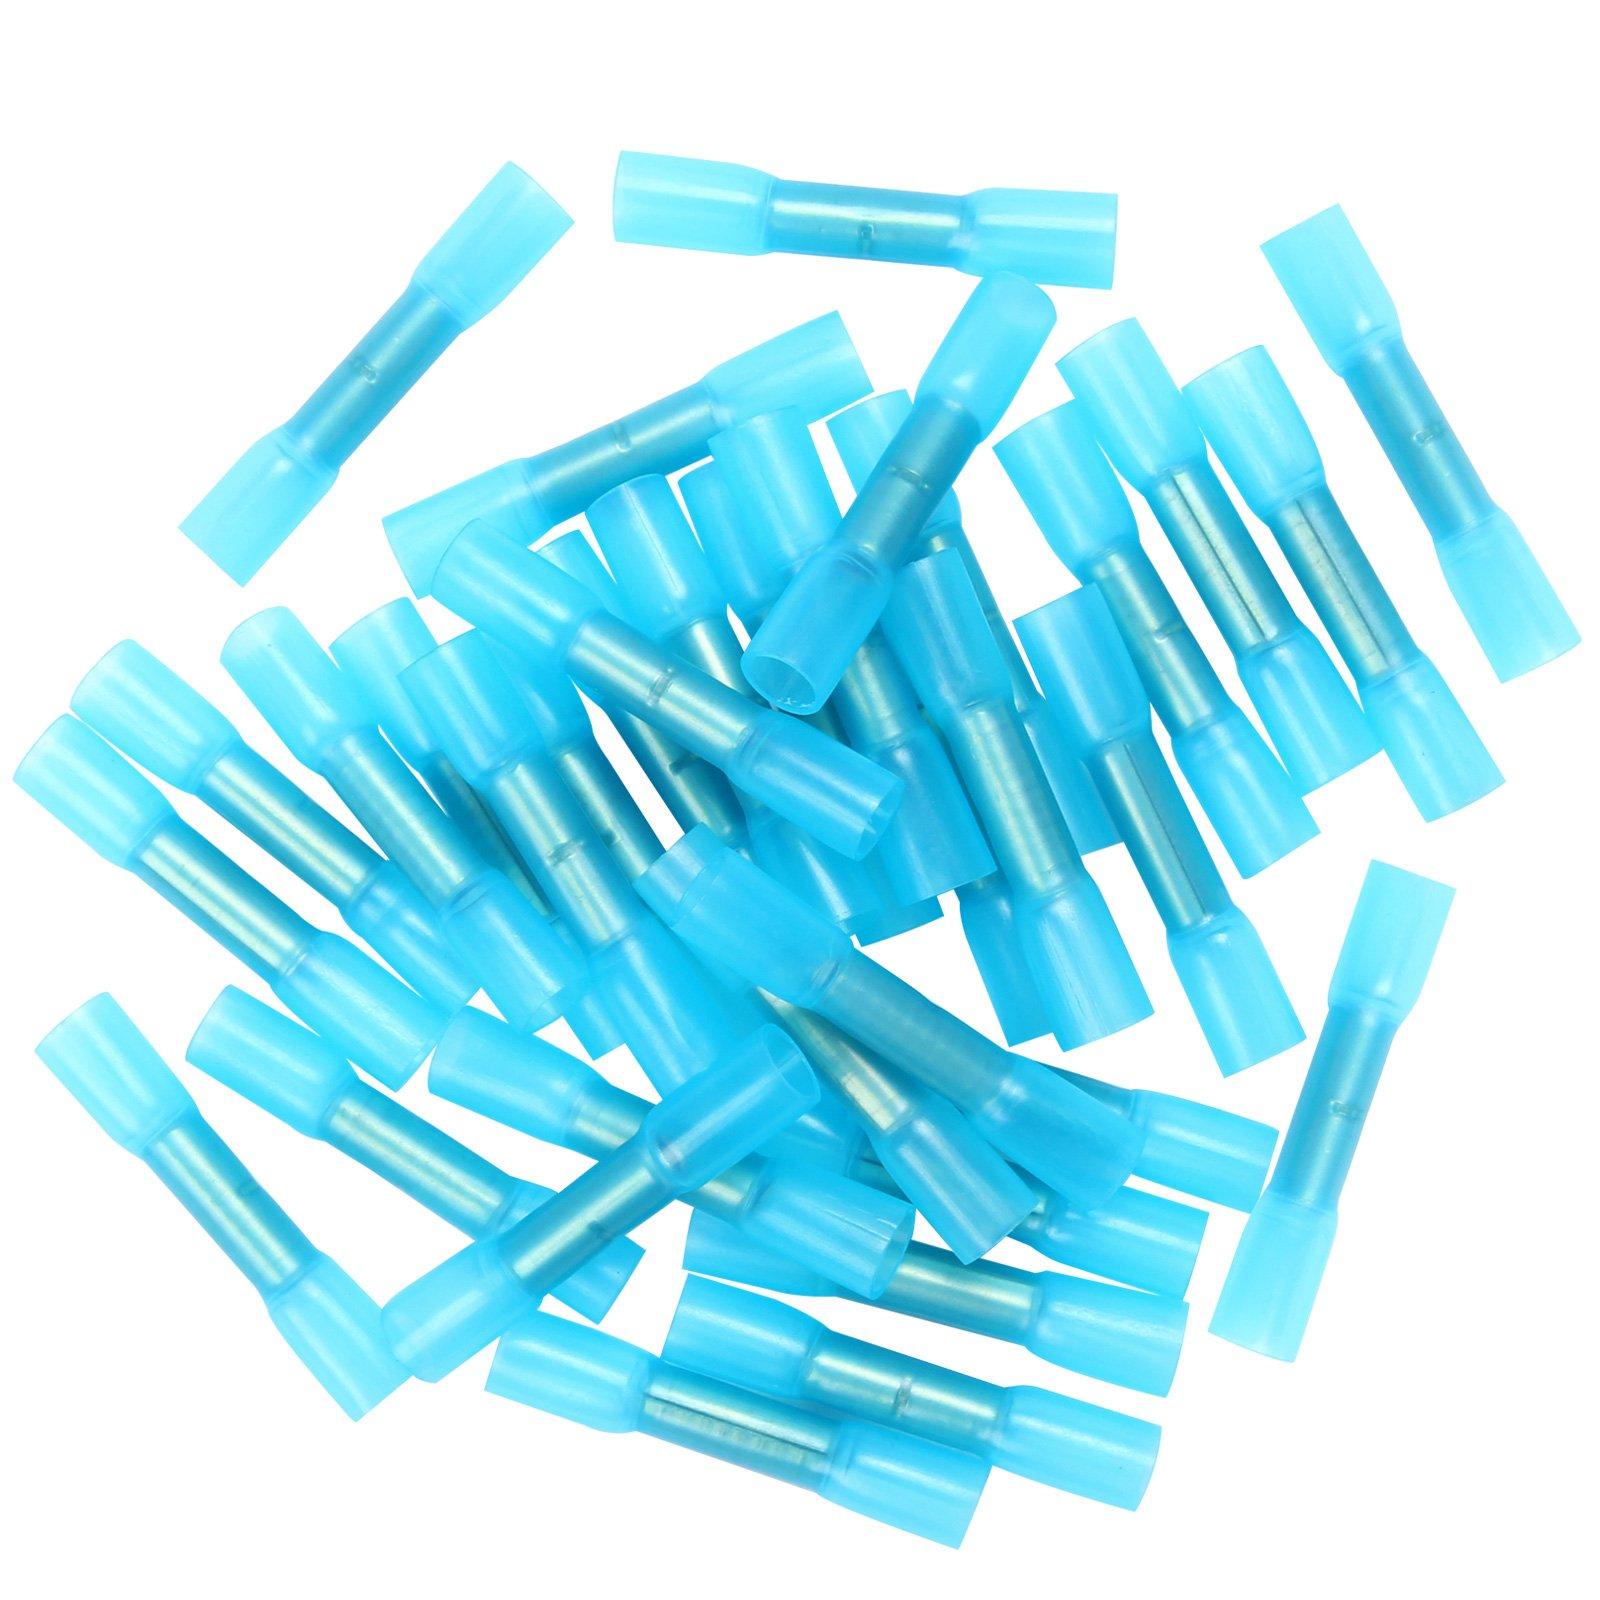 100pcs 16-14 Gauge Insulated Heat Shrink Butt Wire Crimp Connectors Terminals Blue